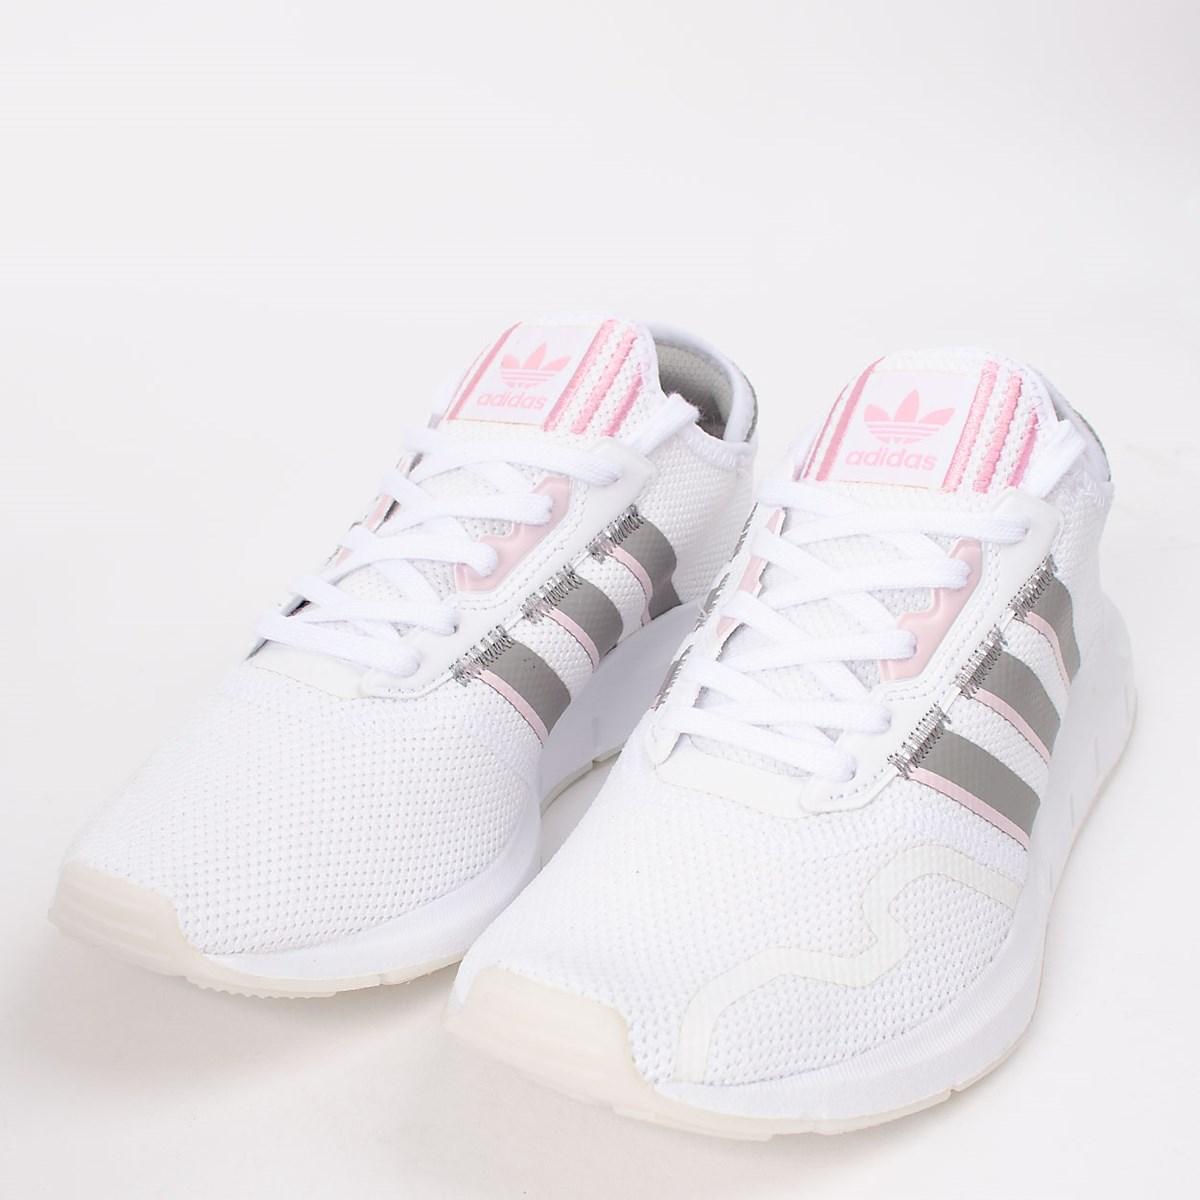 Tênis adidas Swift Run X Cloud White FY5440